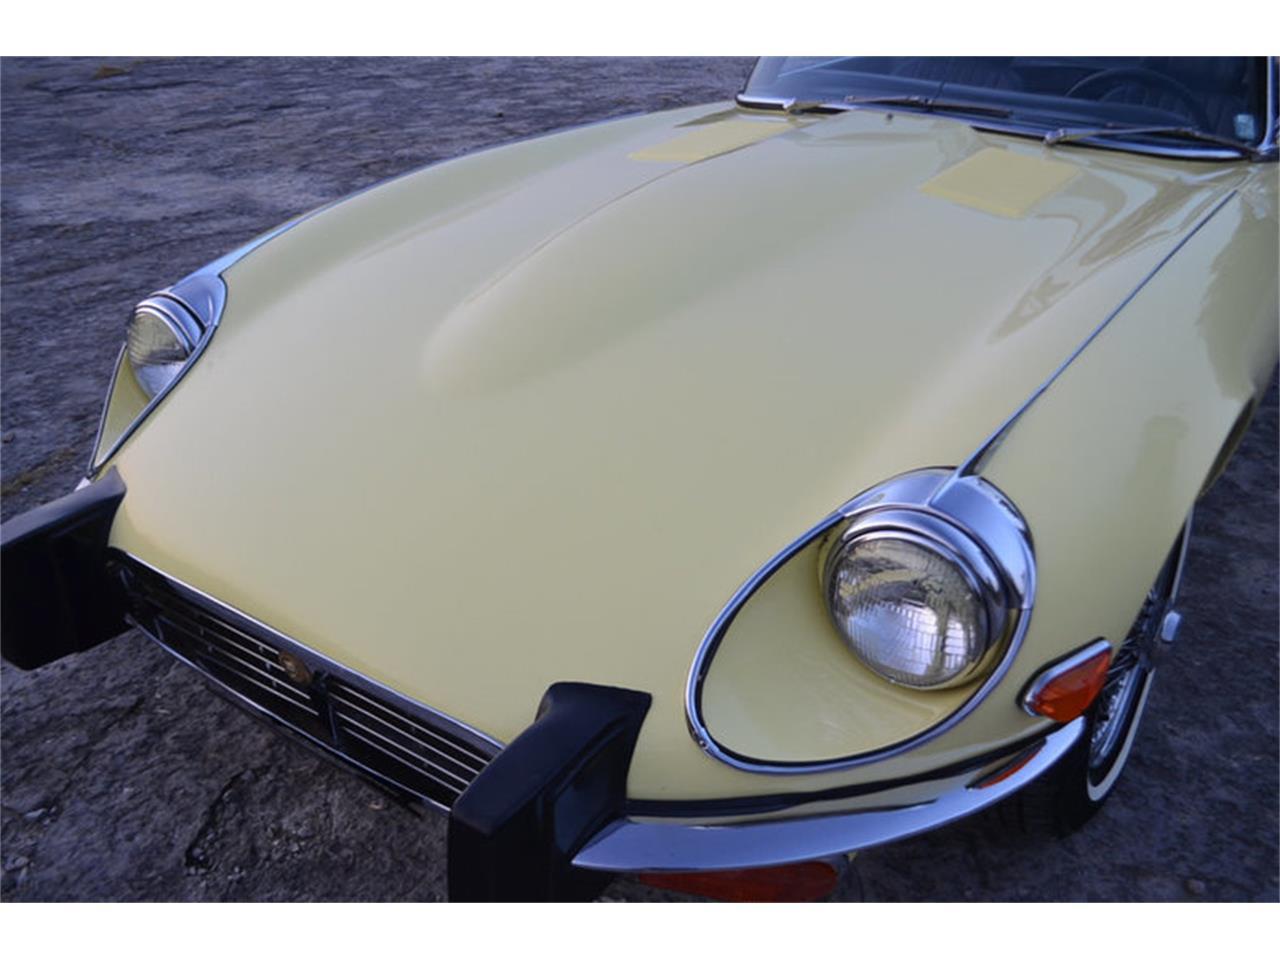 Large Picture of 1974 Jaguar XKE - $68,800.00 Offered by Frazier Motor Car Company - MEJG